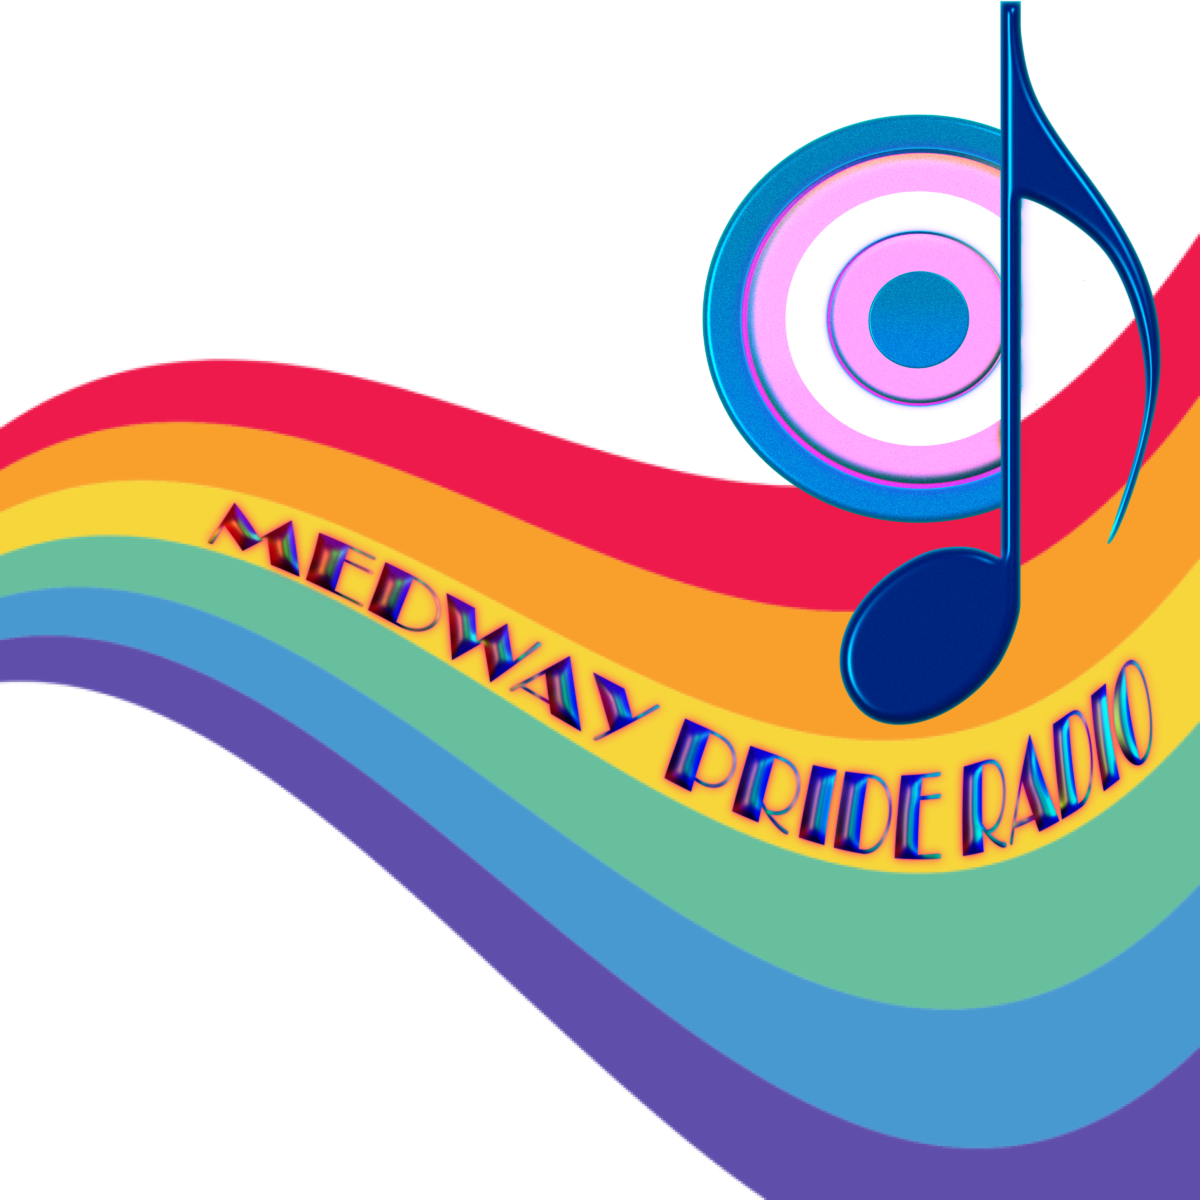 Medway Pride Radio Logo